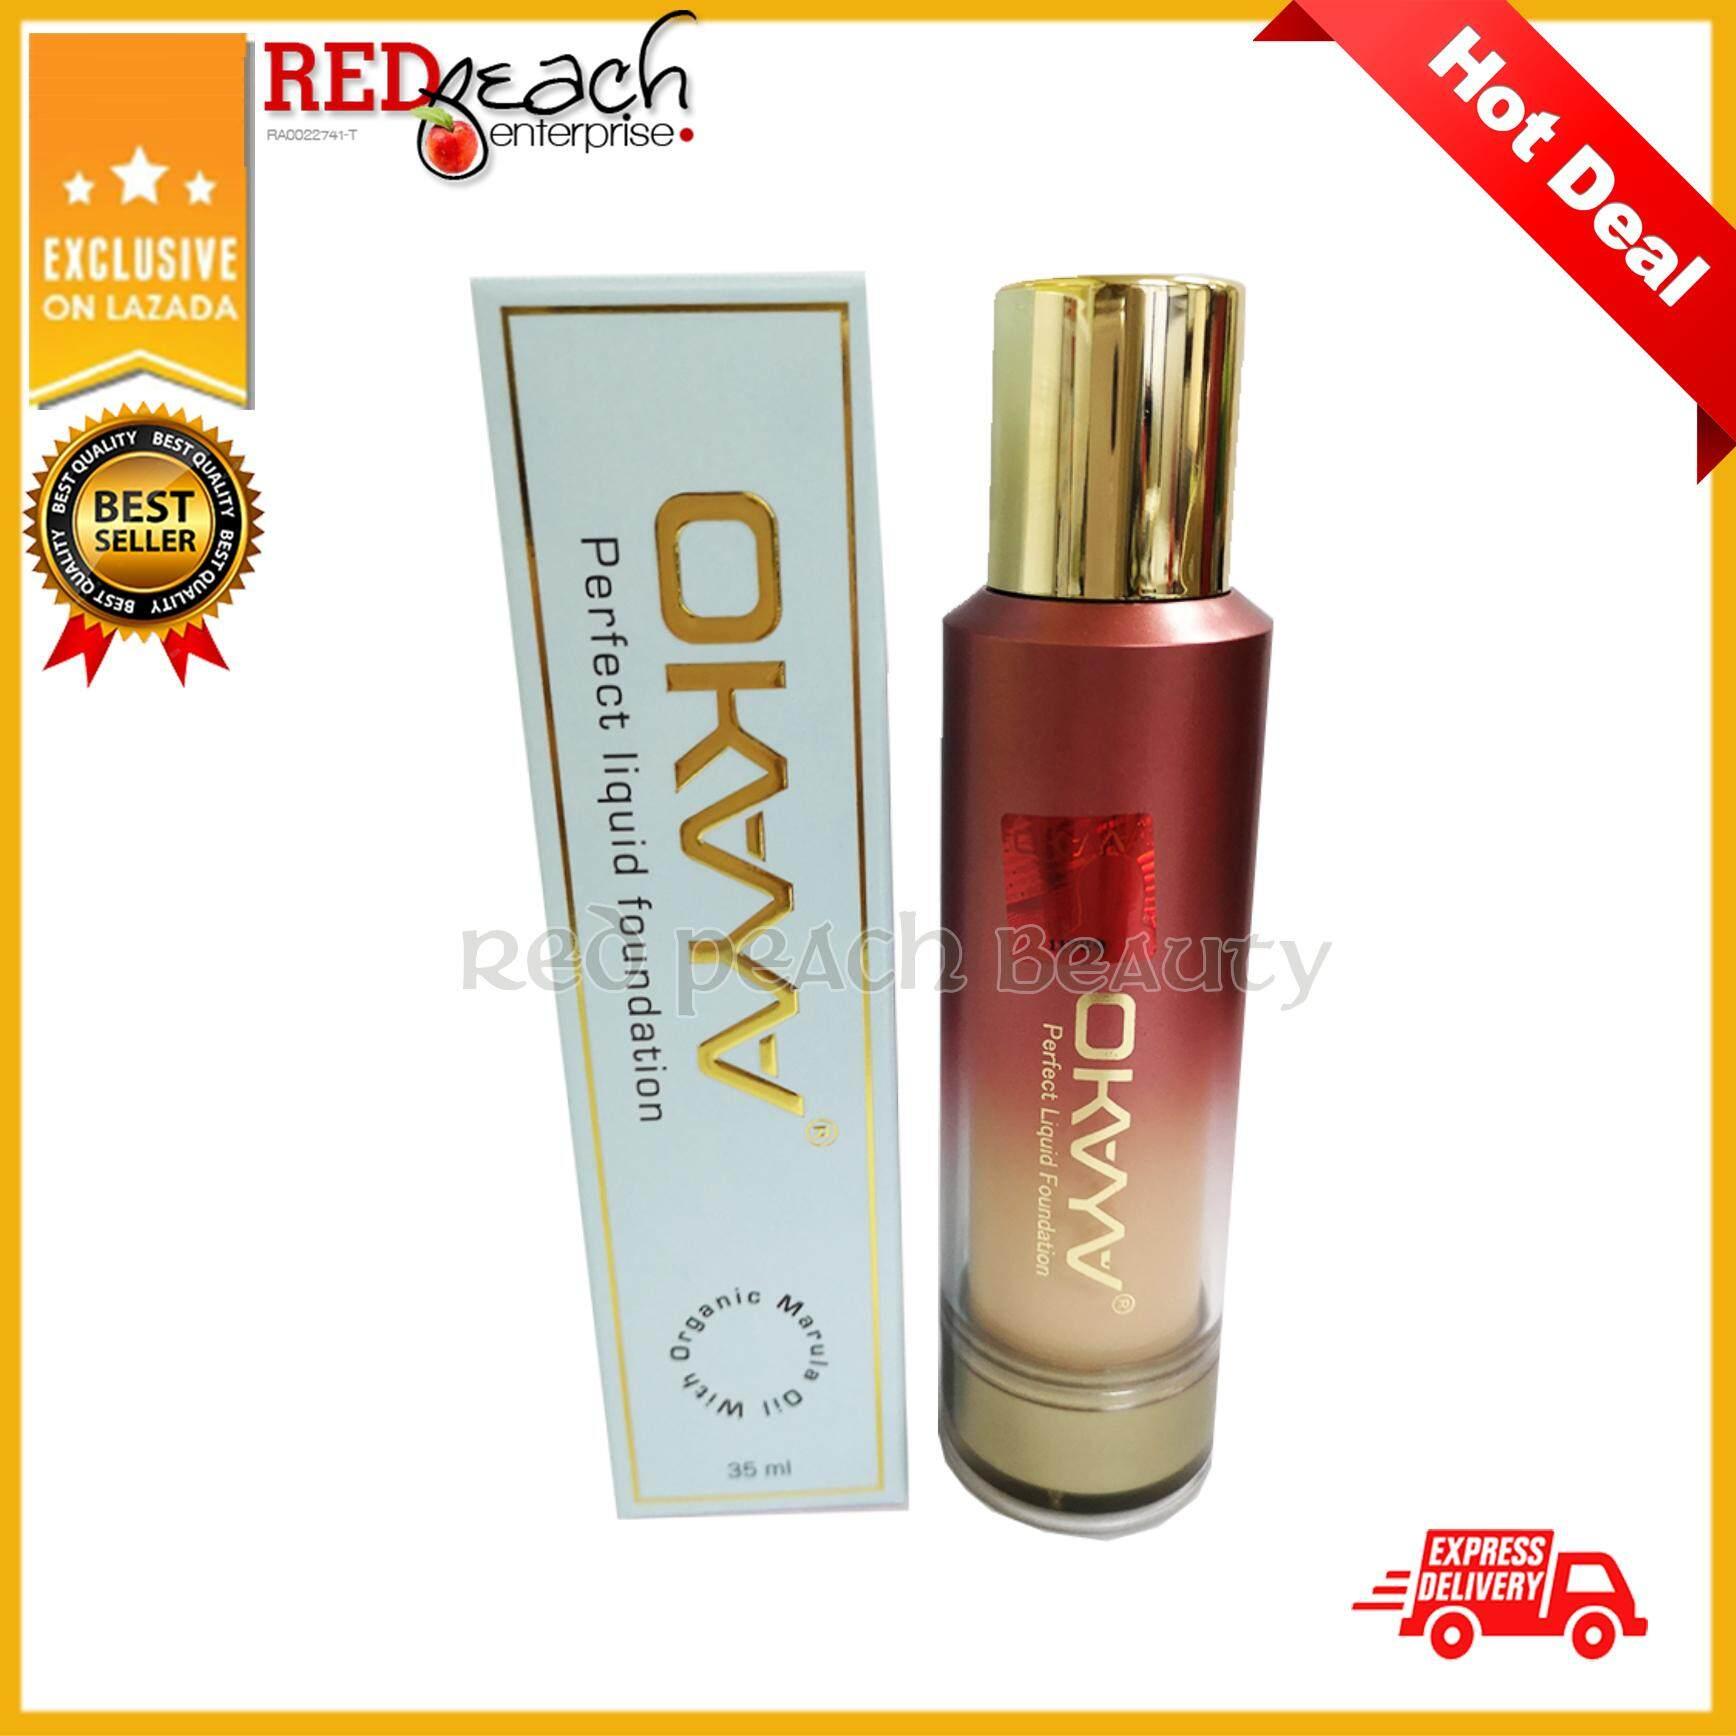 Okaya Face Makeup Foundations Price In Malaysia Best Cream Walet Super Gold Perfect Liquid Foundation Dark 100 Original Hq Hot Sale